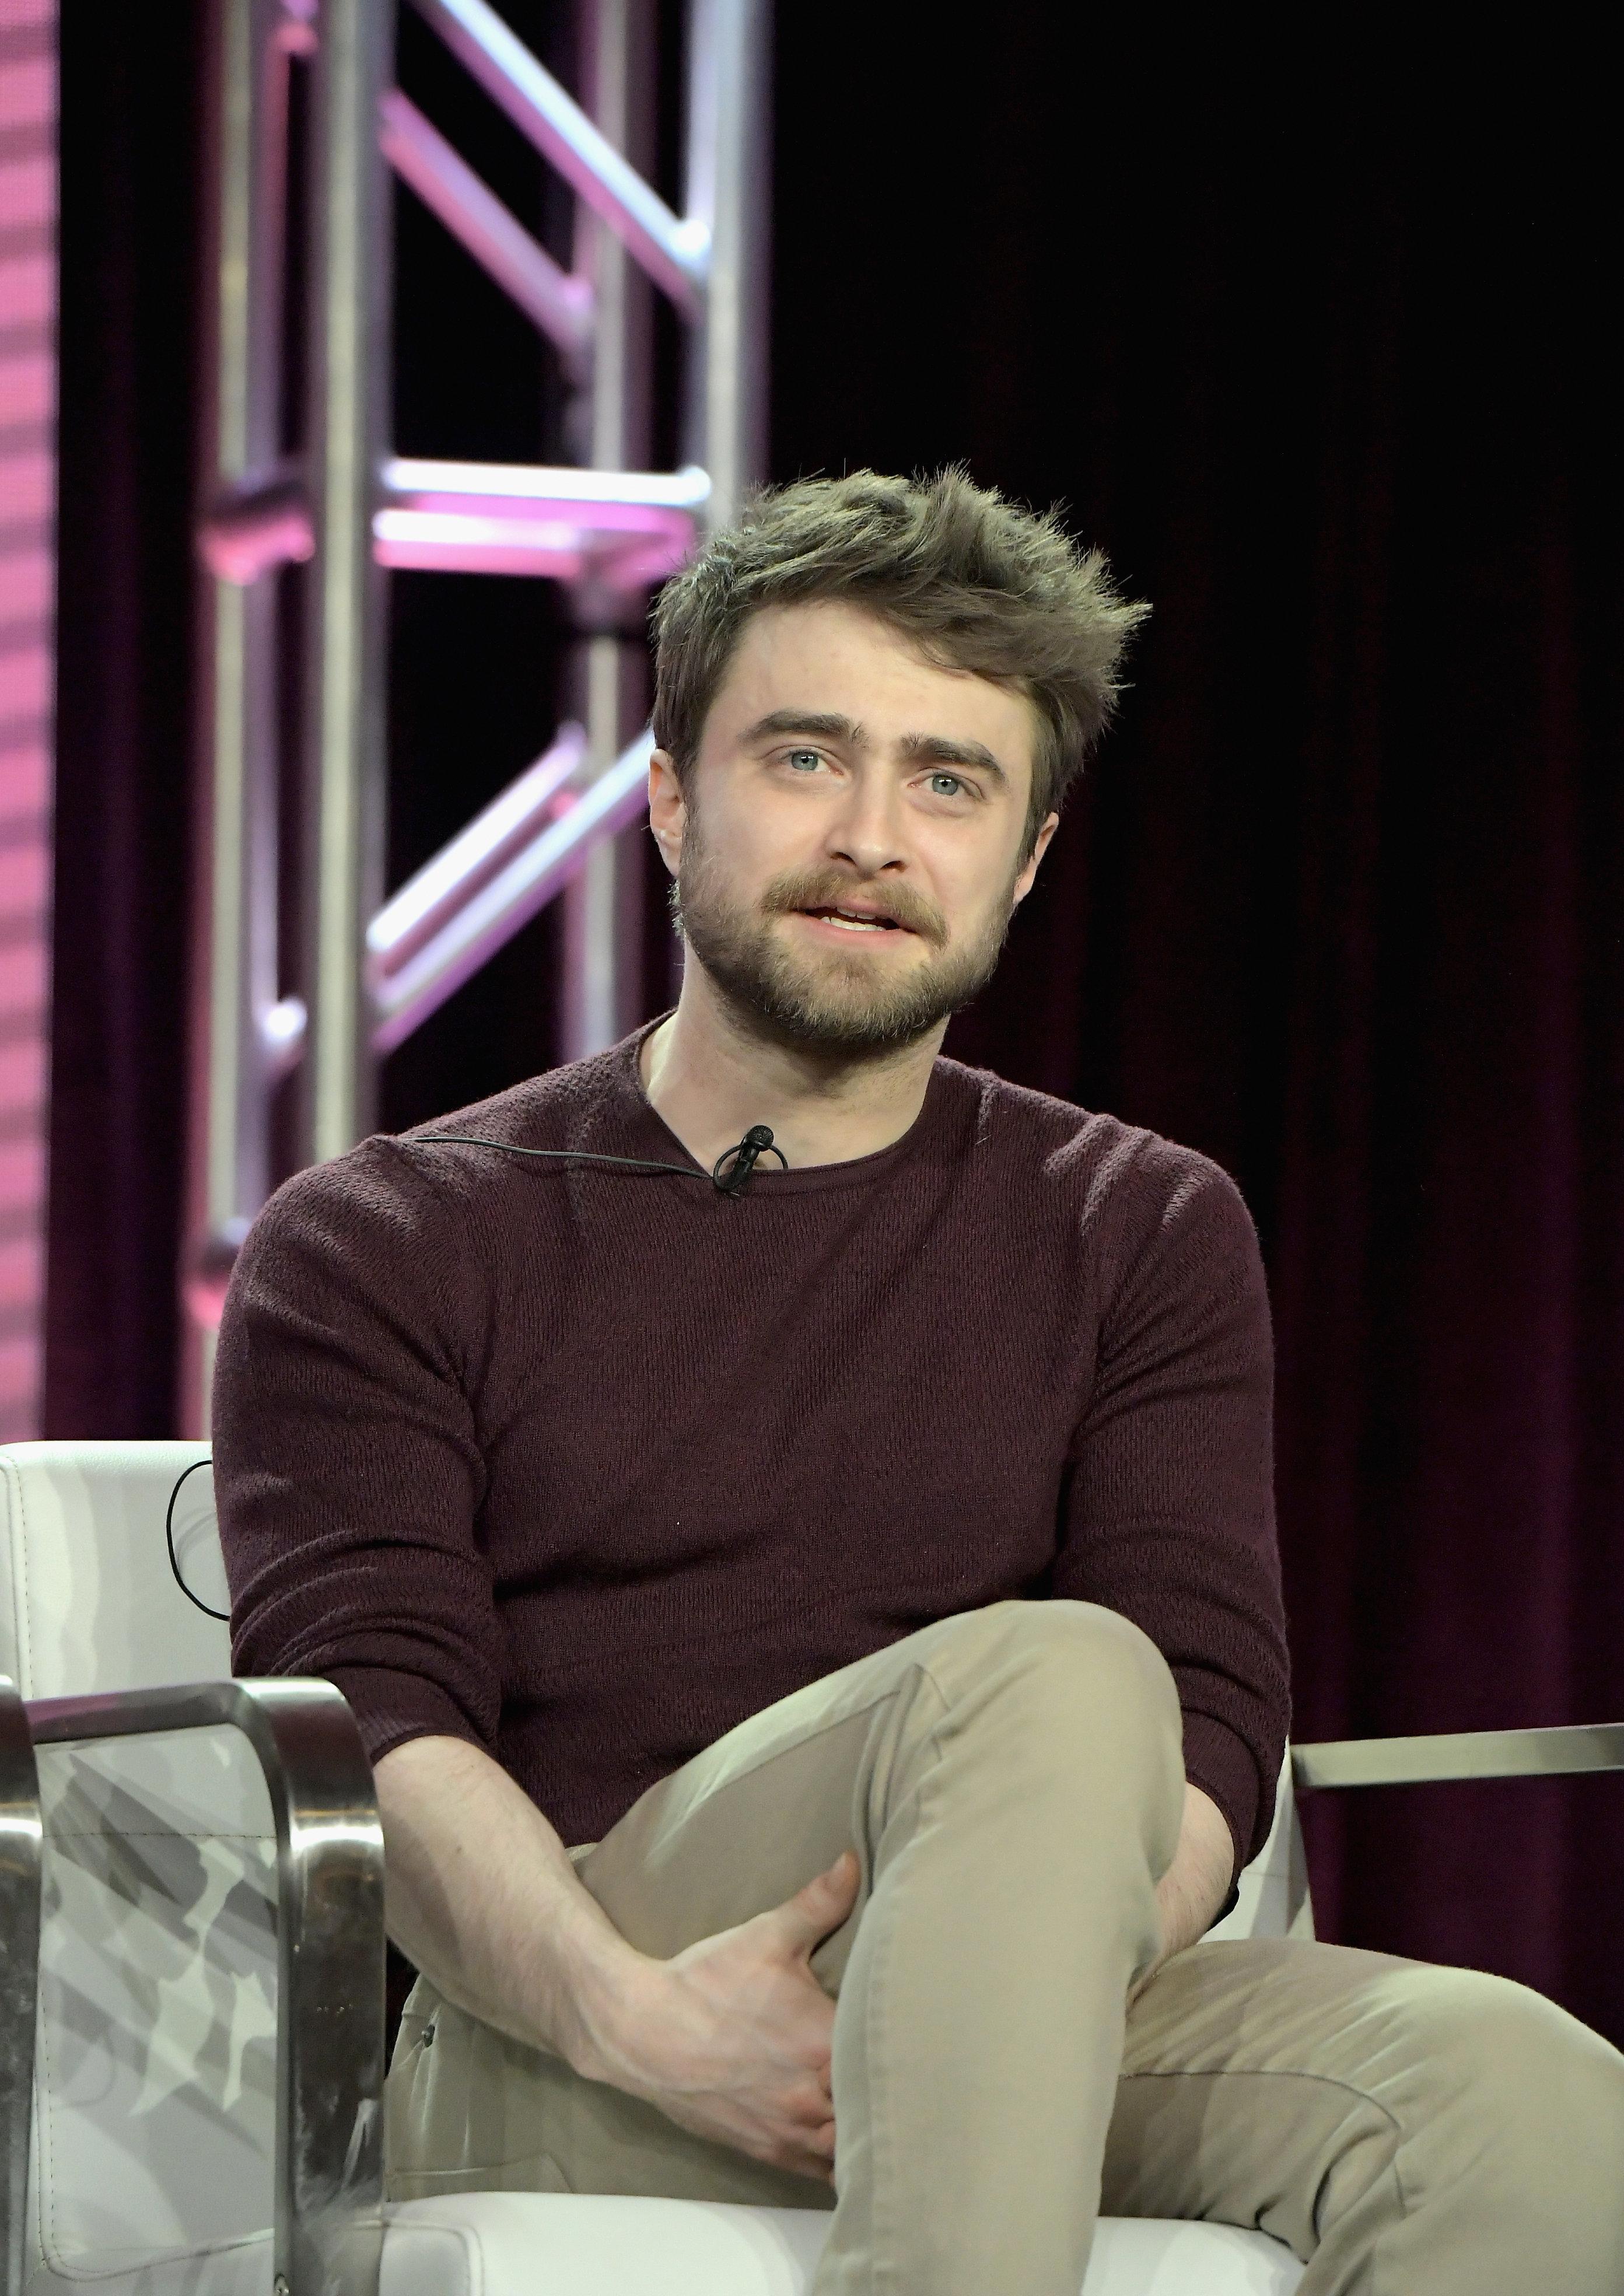 Daniel Radcliffe of